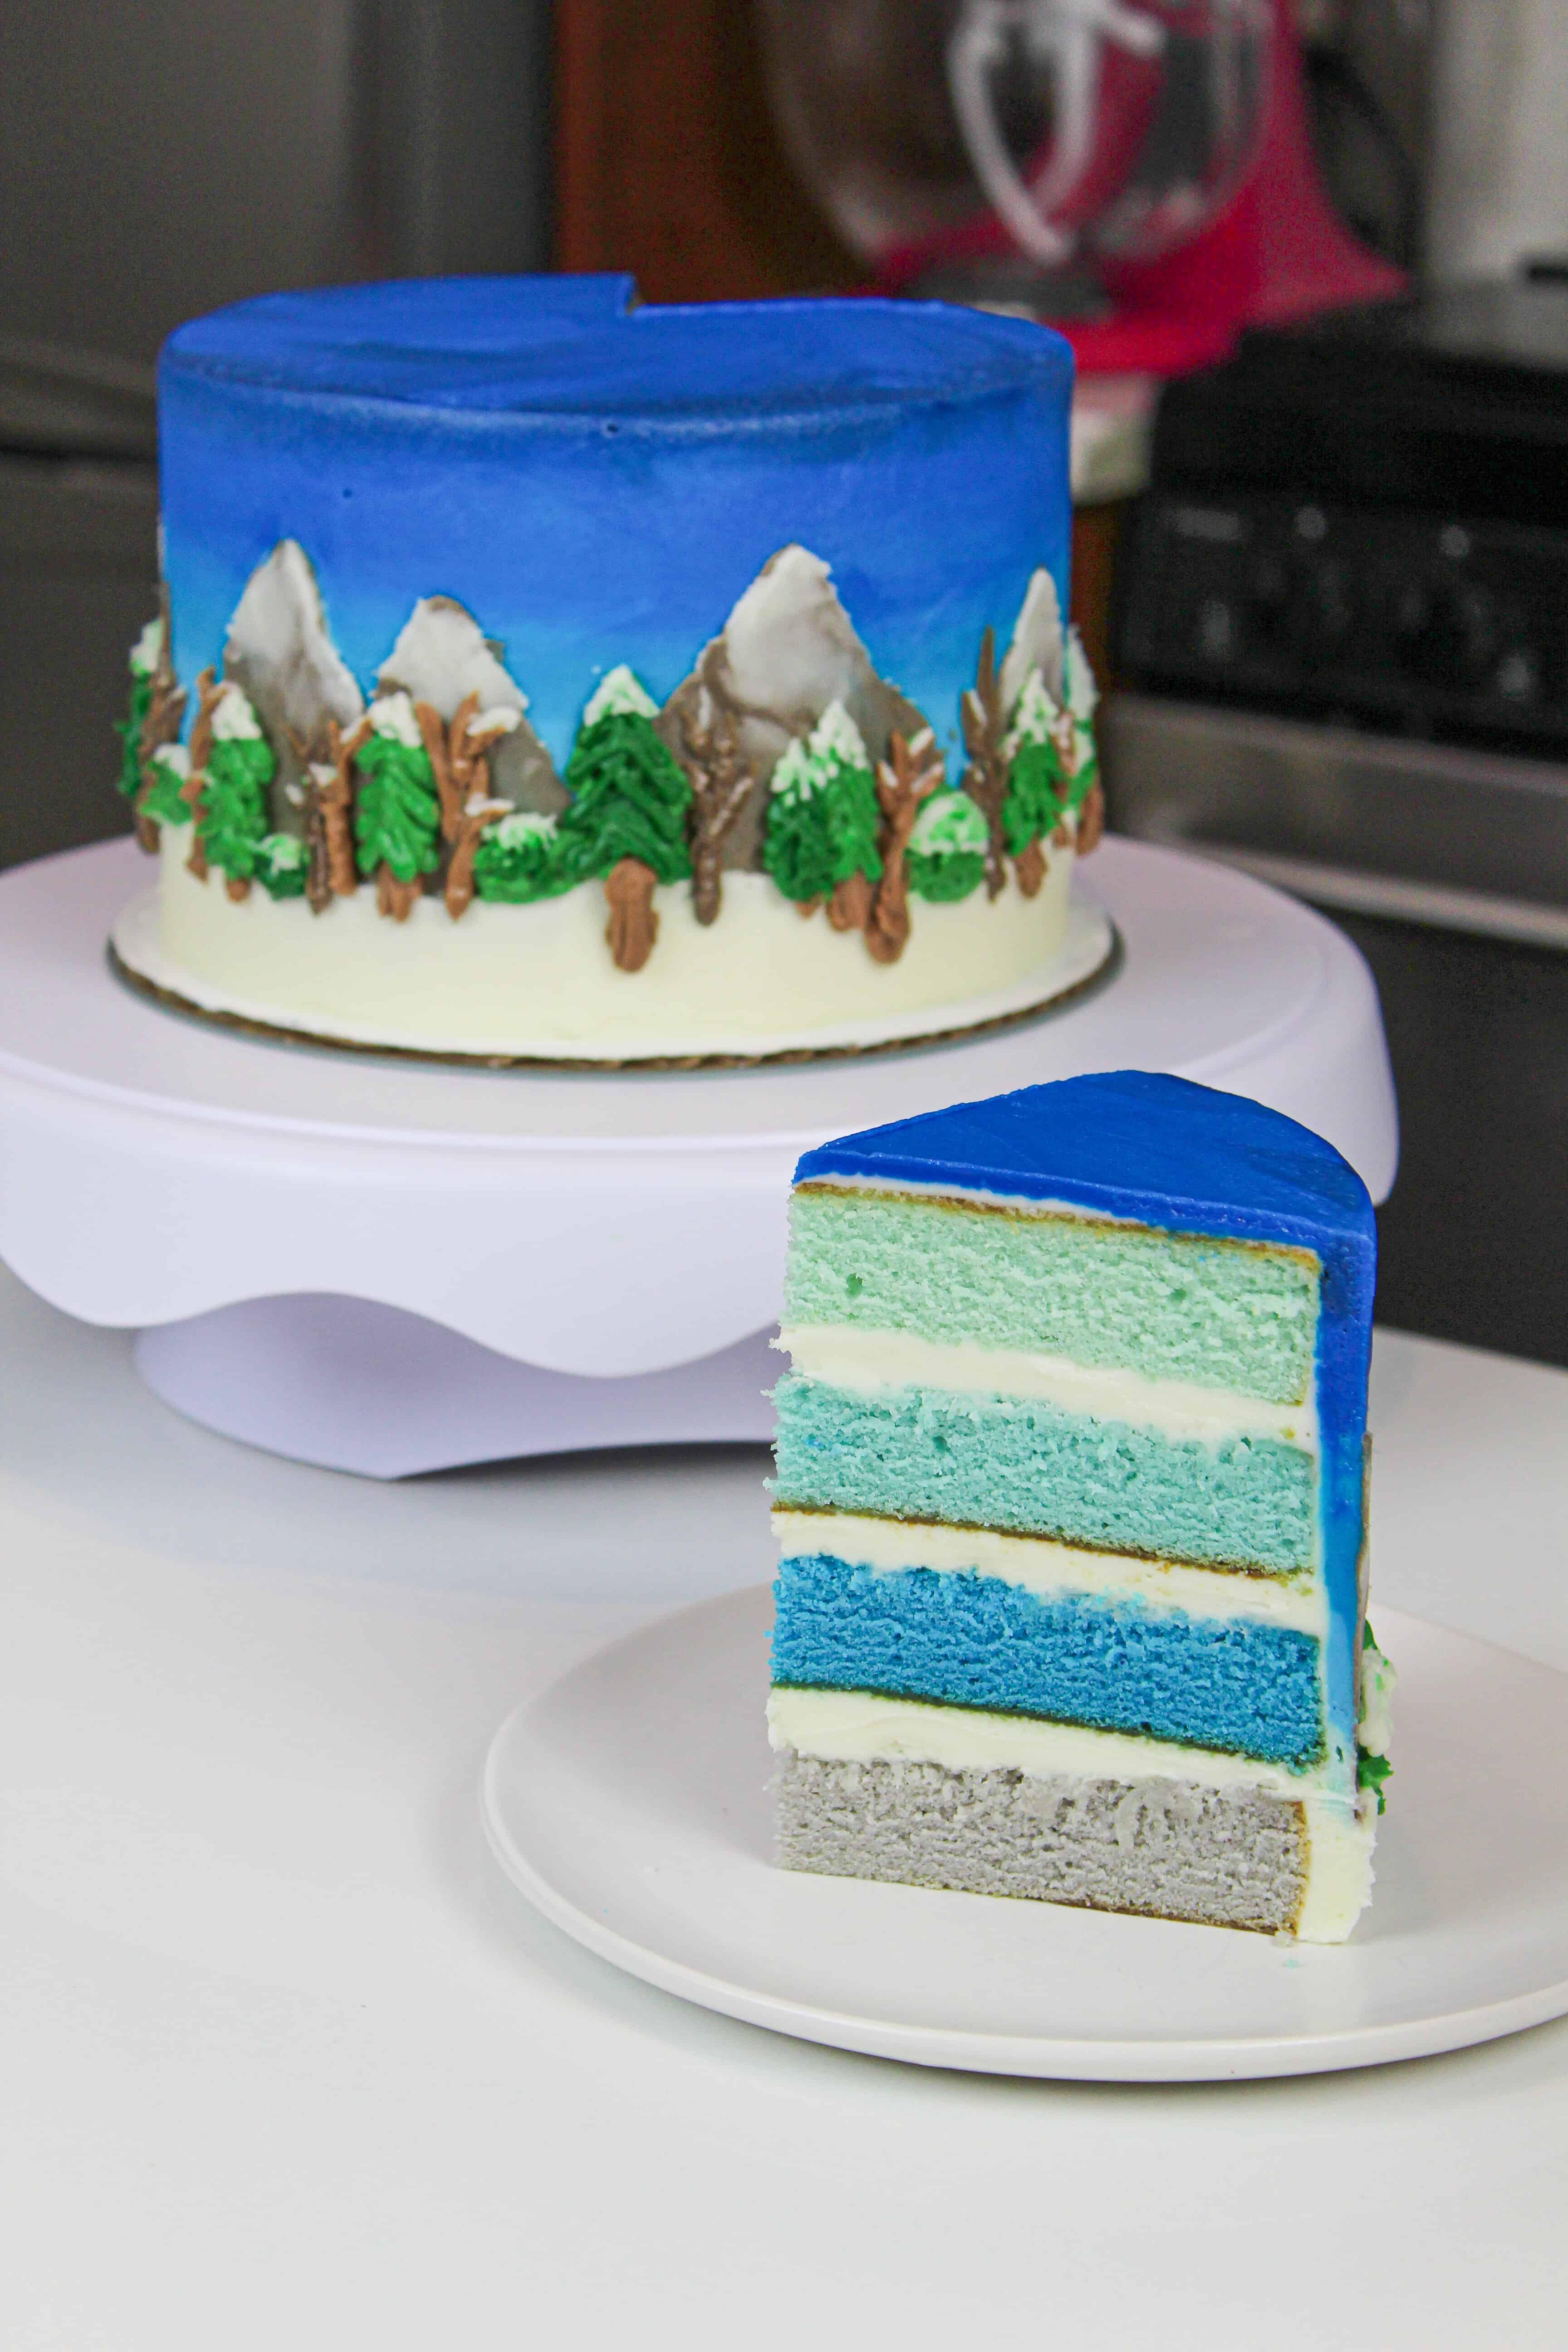 image of sliced winter wonderland cake